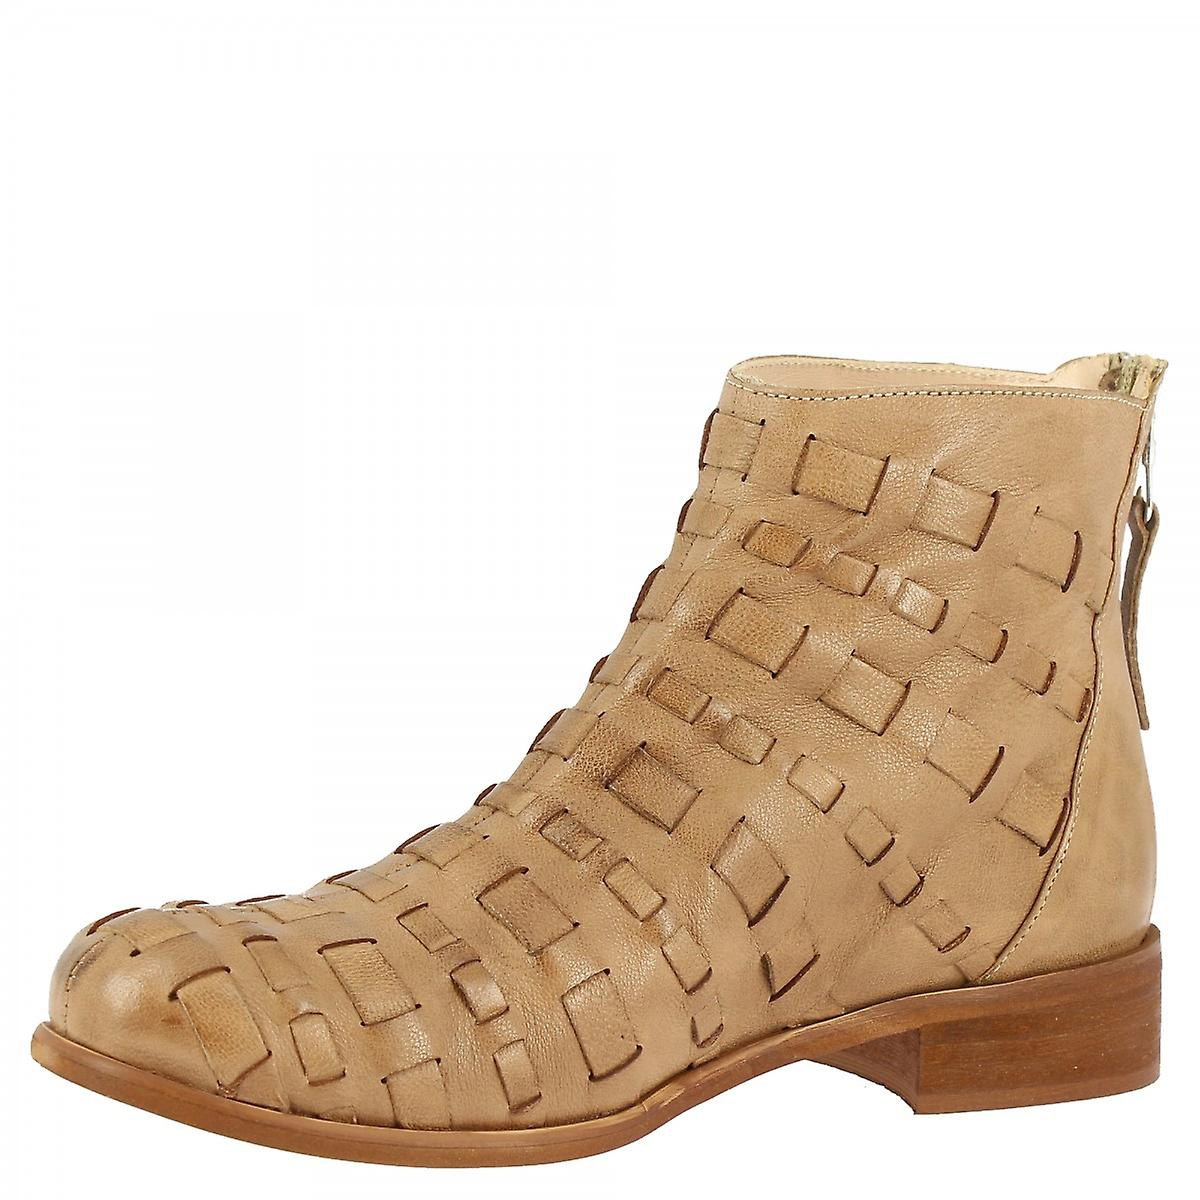 Leonardo Shoes Women's Handmade Ankle Boots Brown Calf Leather Back Zip Closure